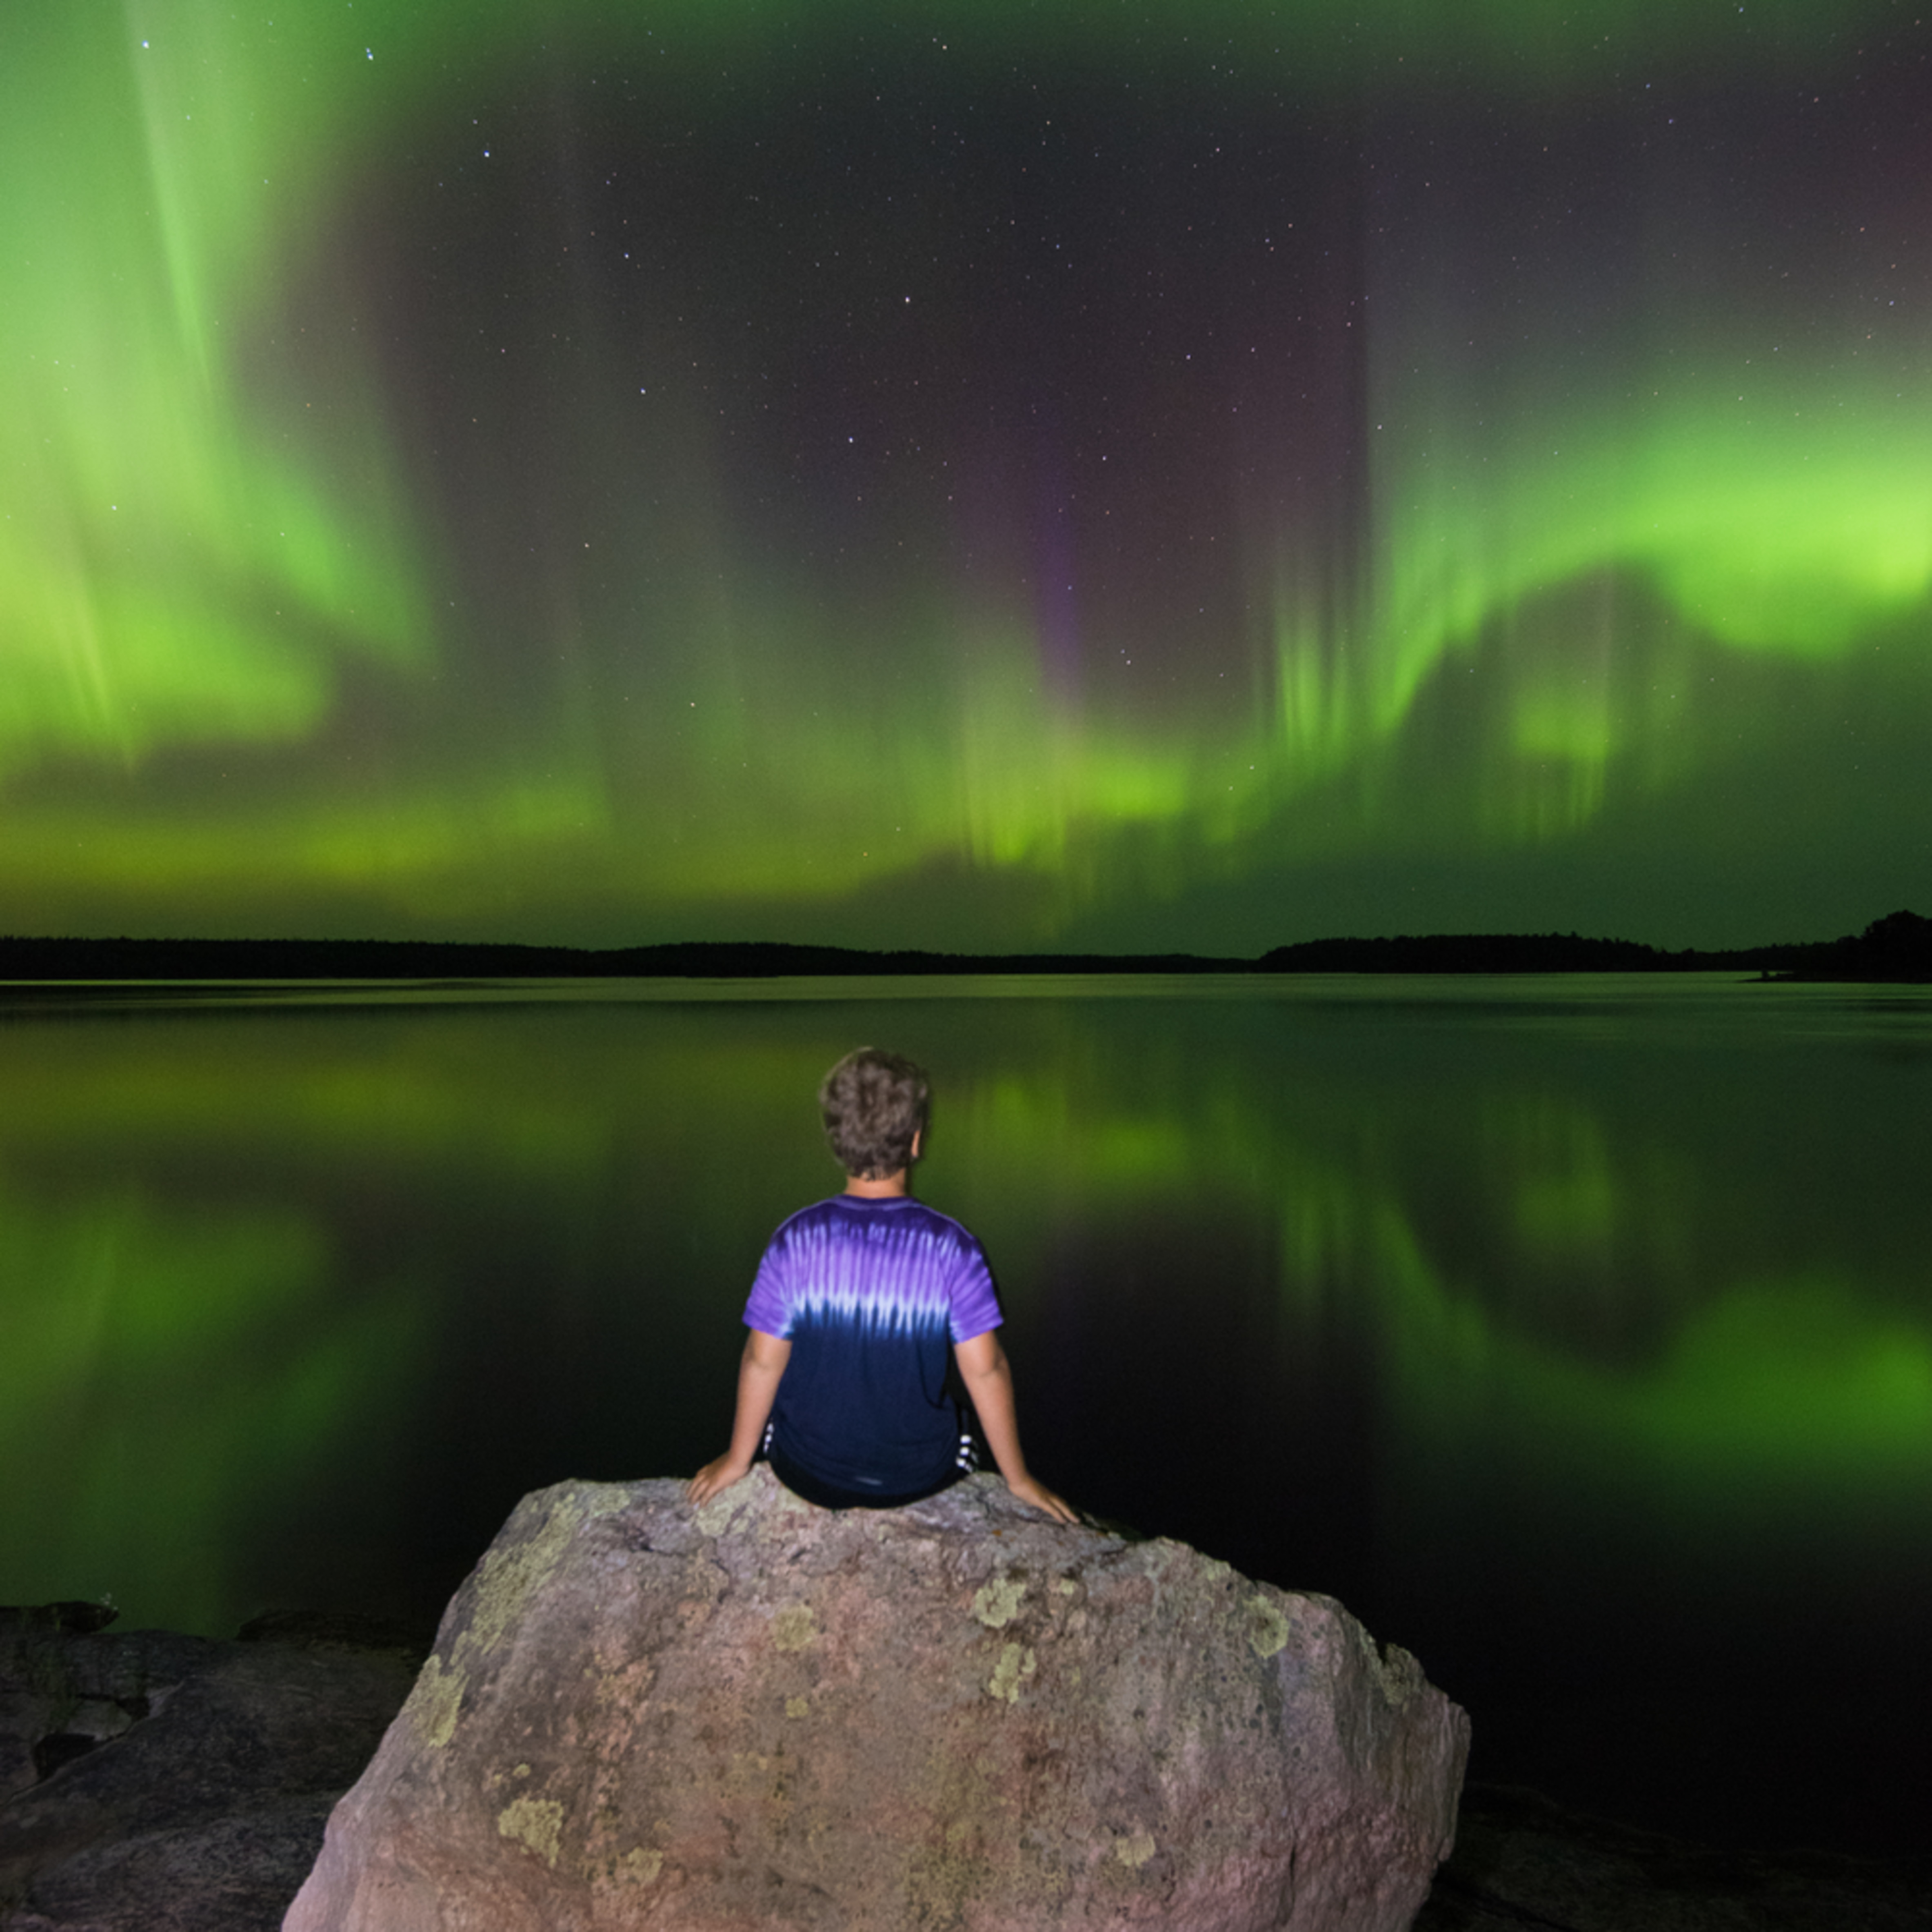 Point rock aurora kenora heather k jones ytm9lm